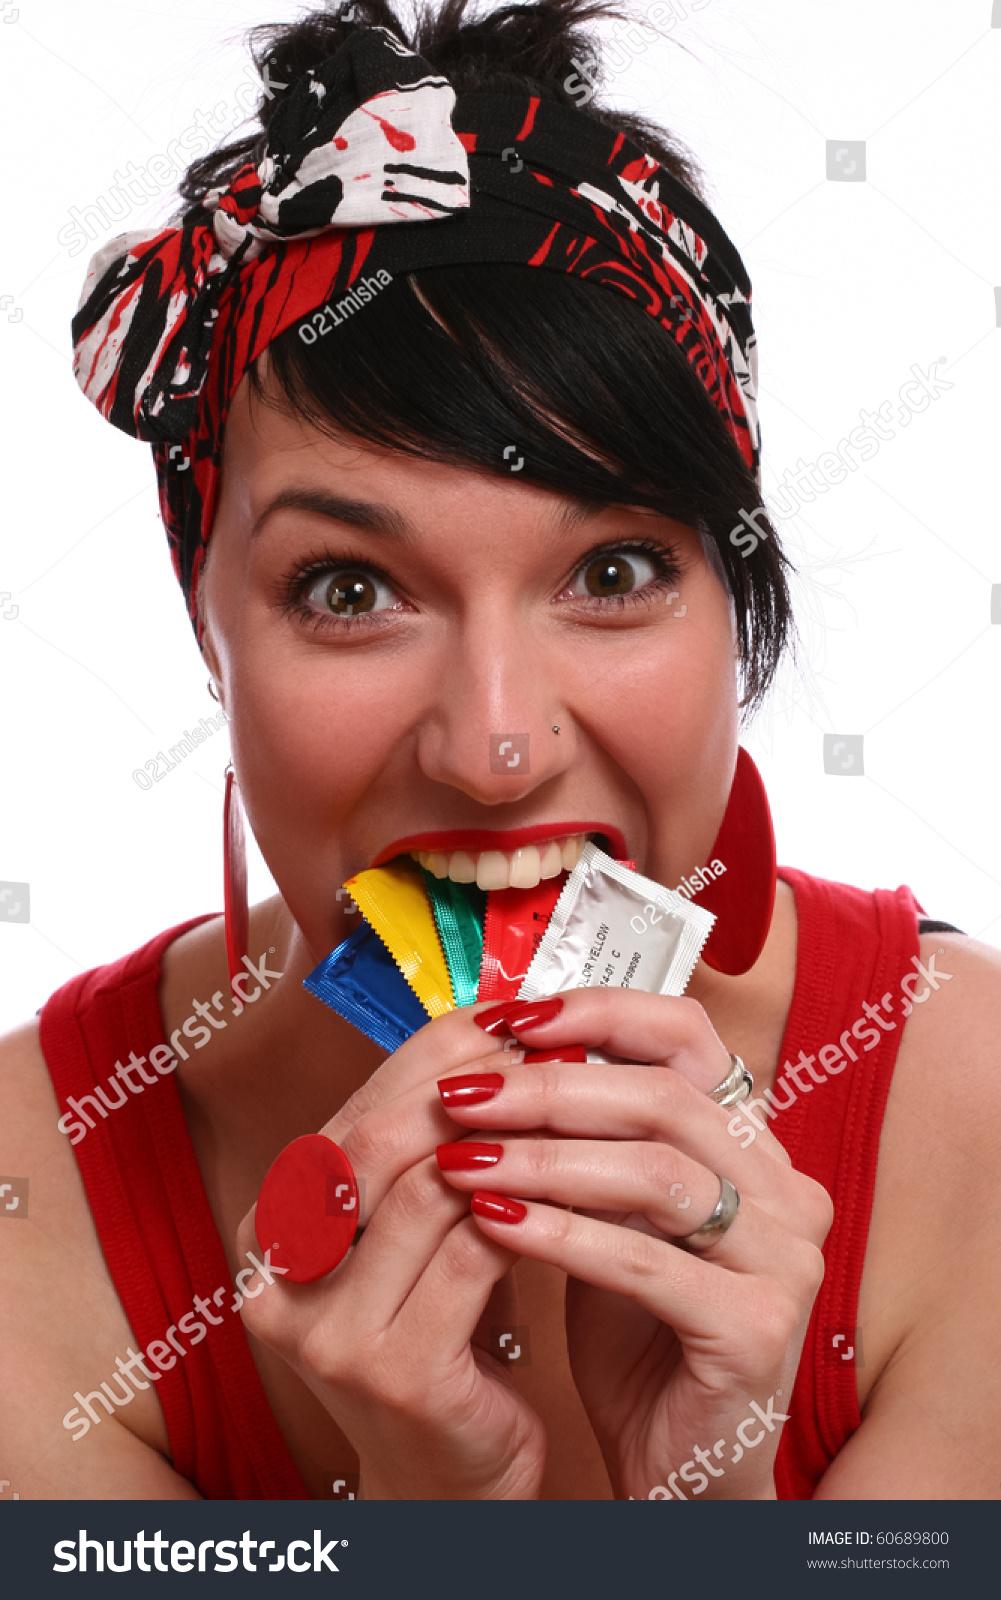 Wear condom girl